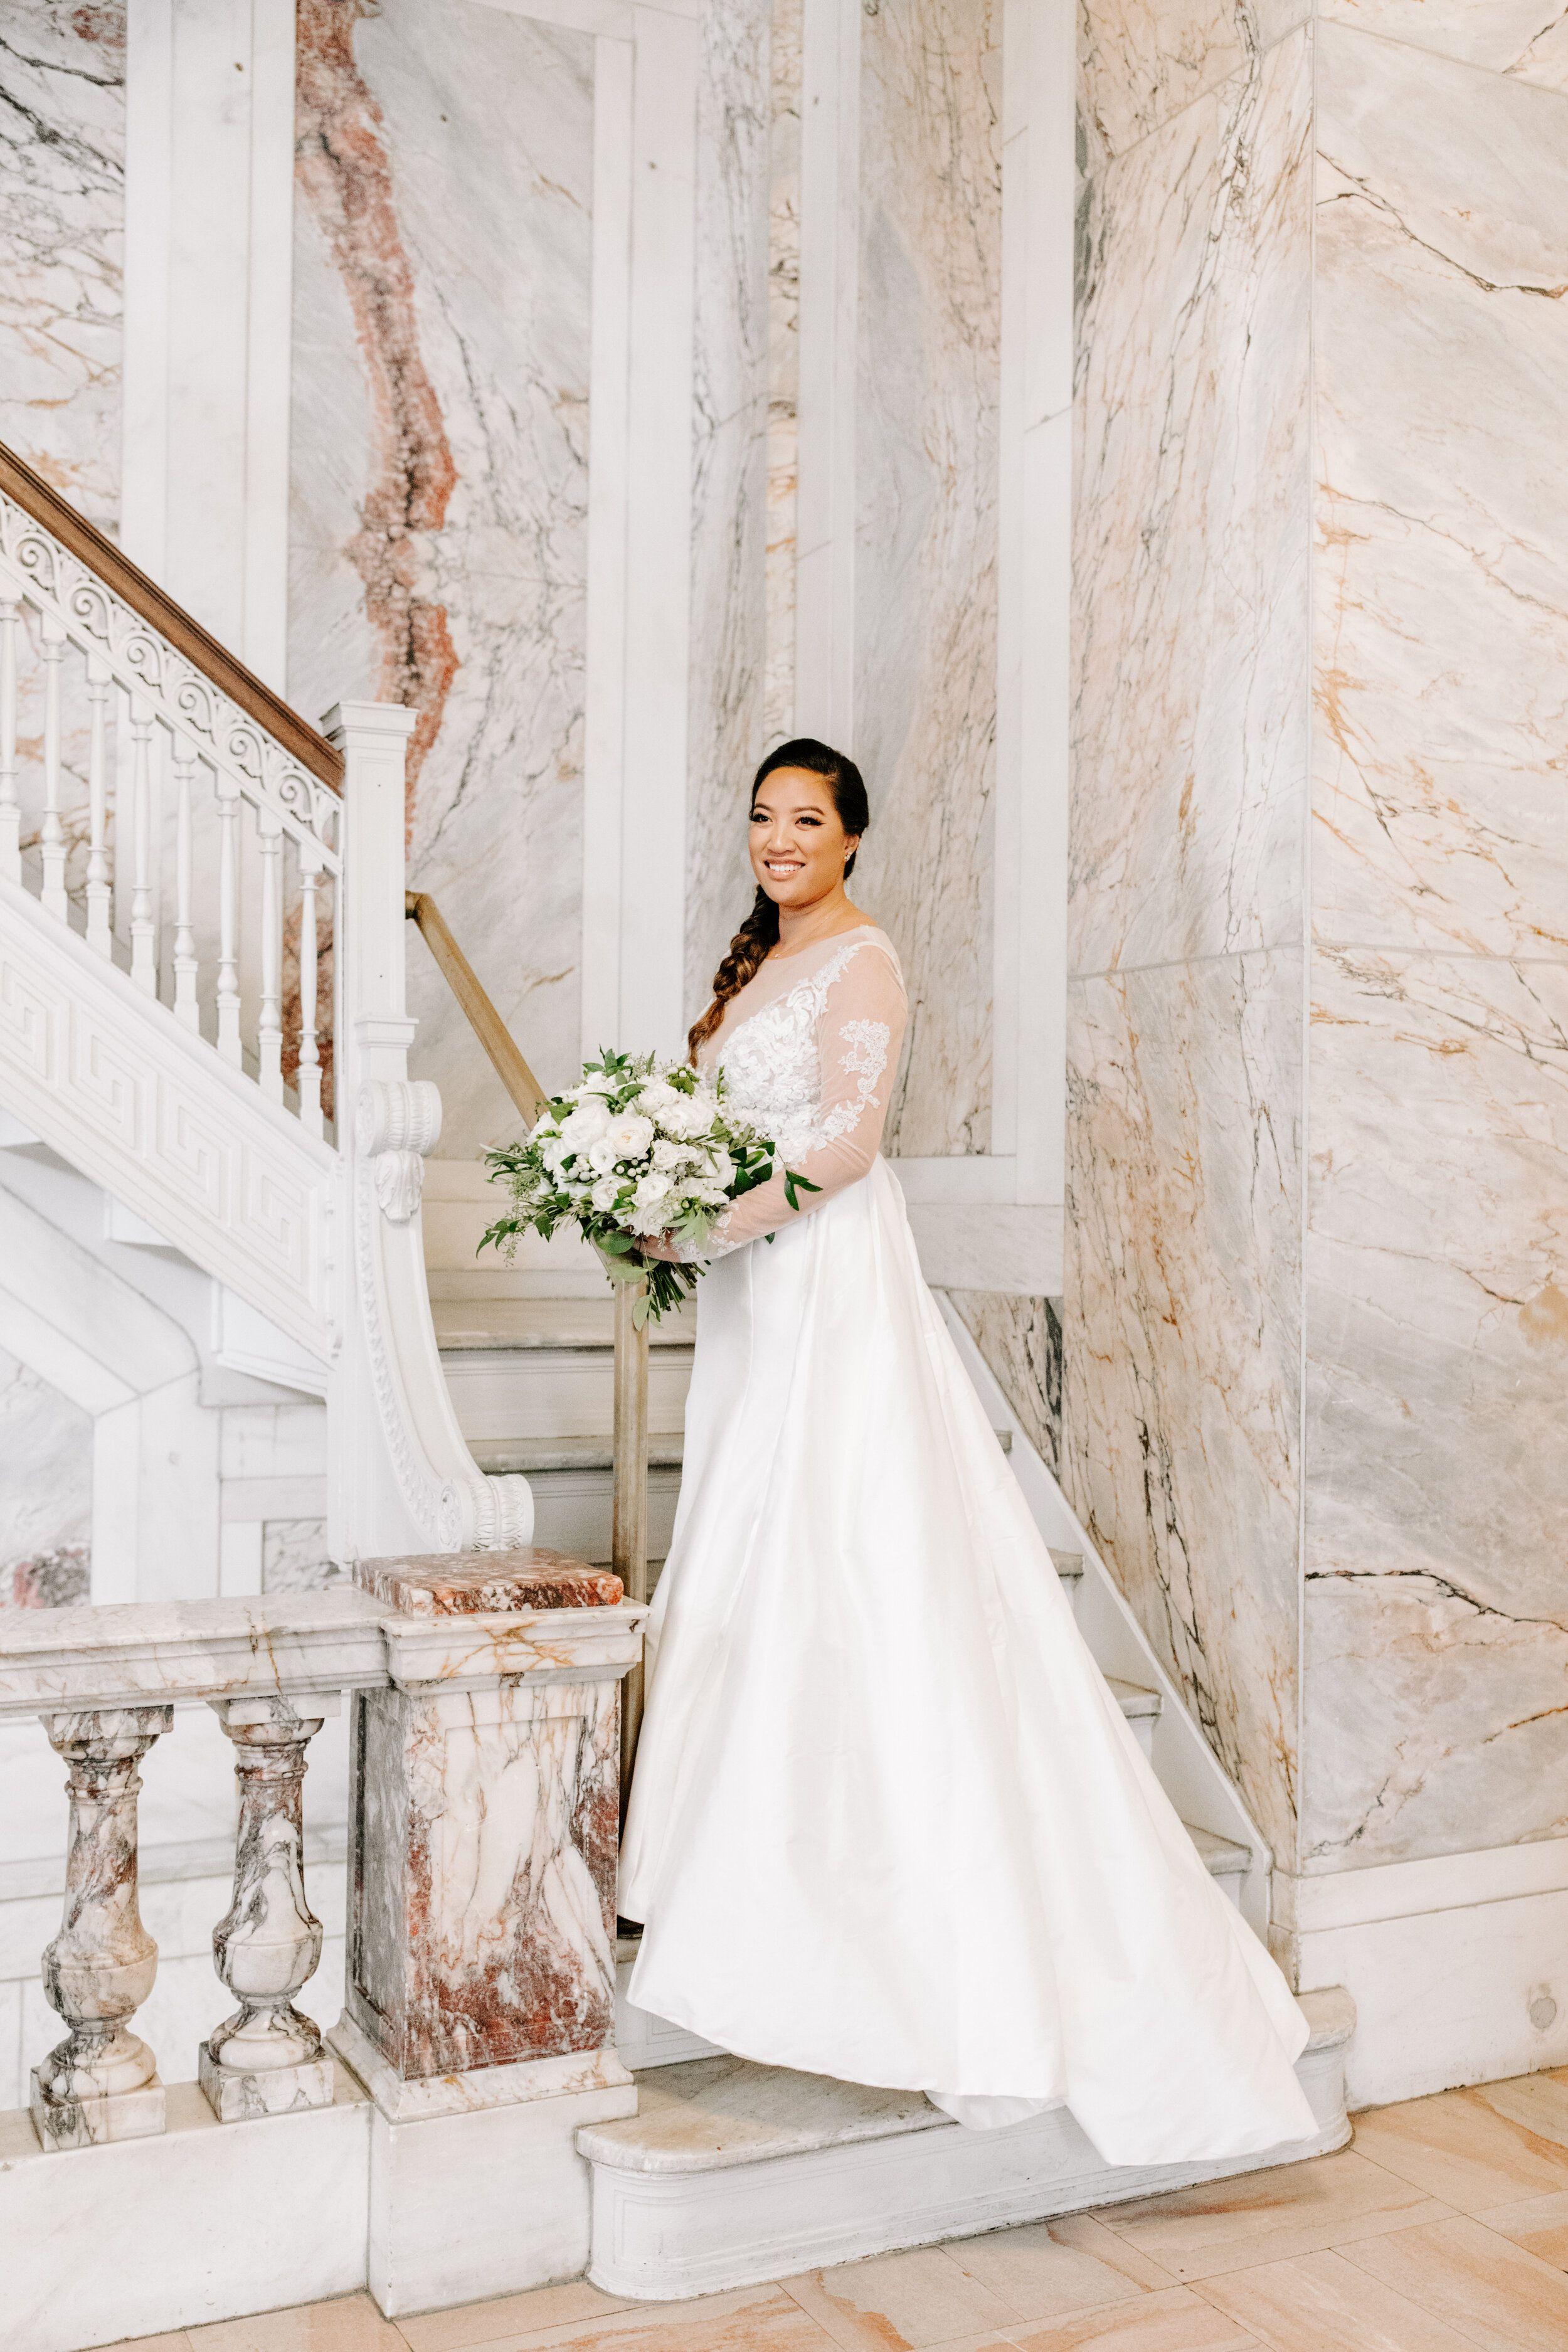 Erika Sean Heidi Elnora Atelier In 2020 October Wedding Dresses Long Sleeve Wedding Dress Lace Wedding Dresses